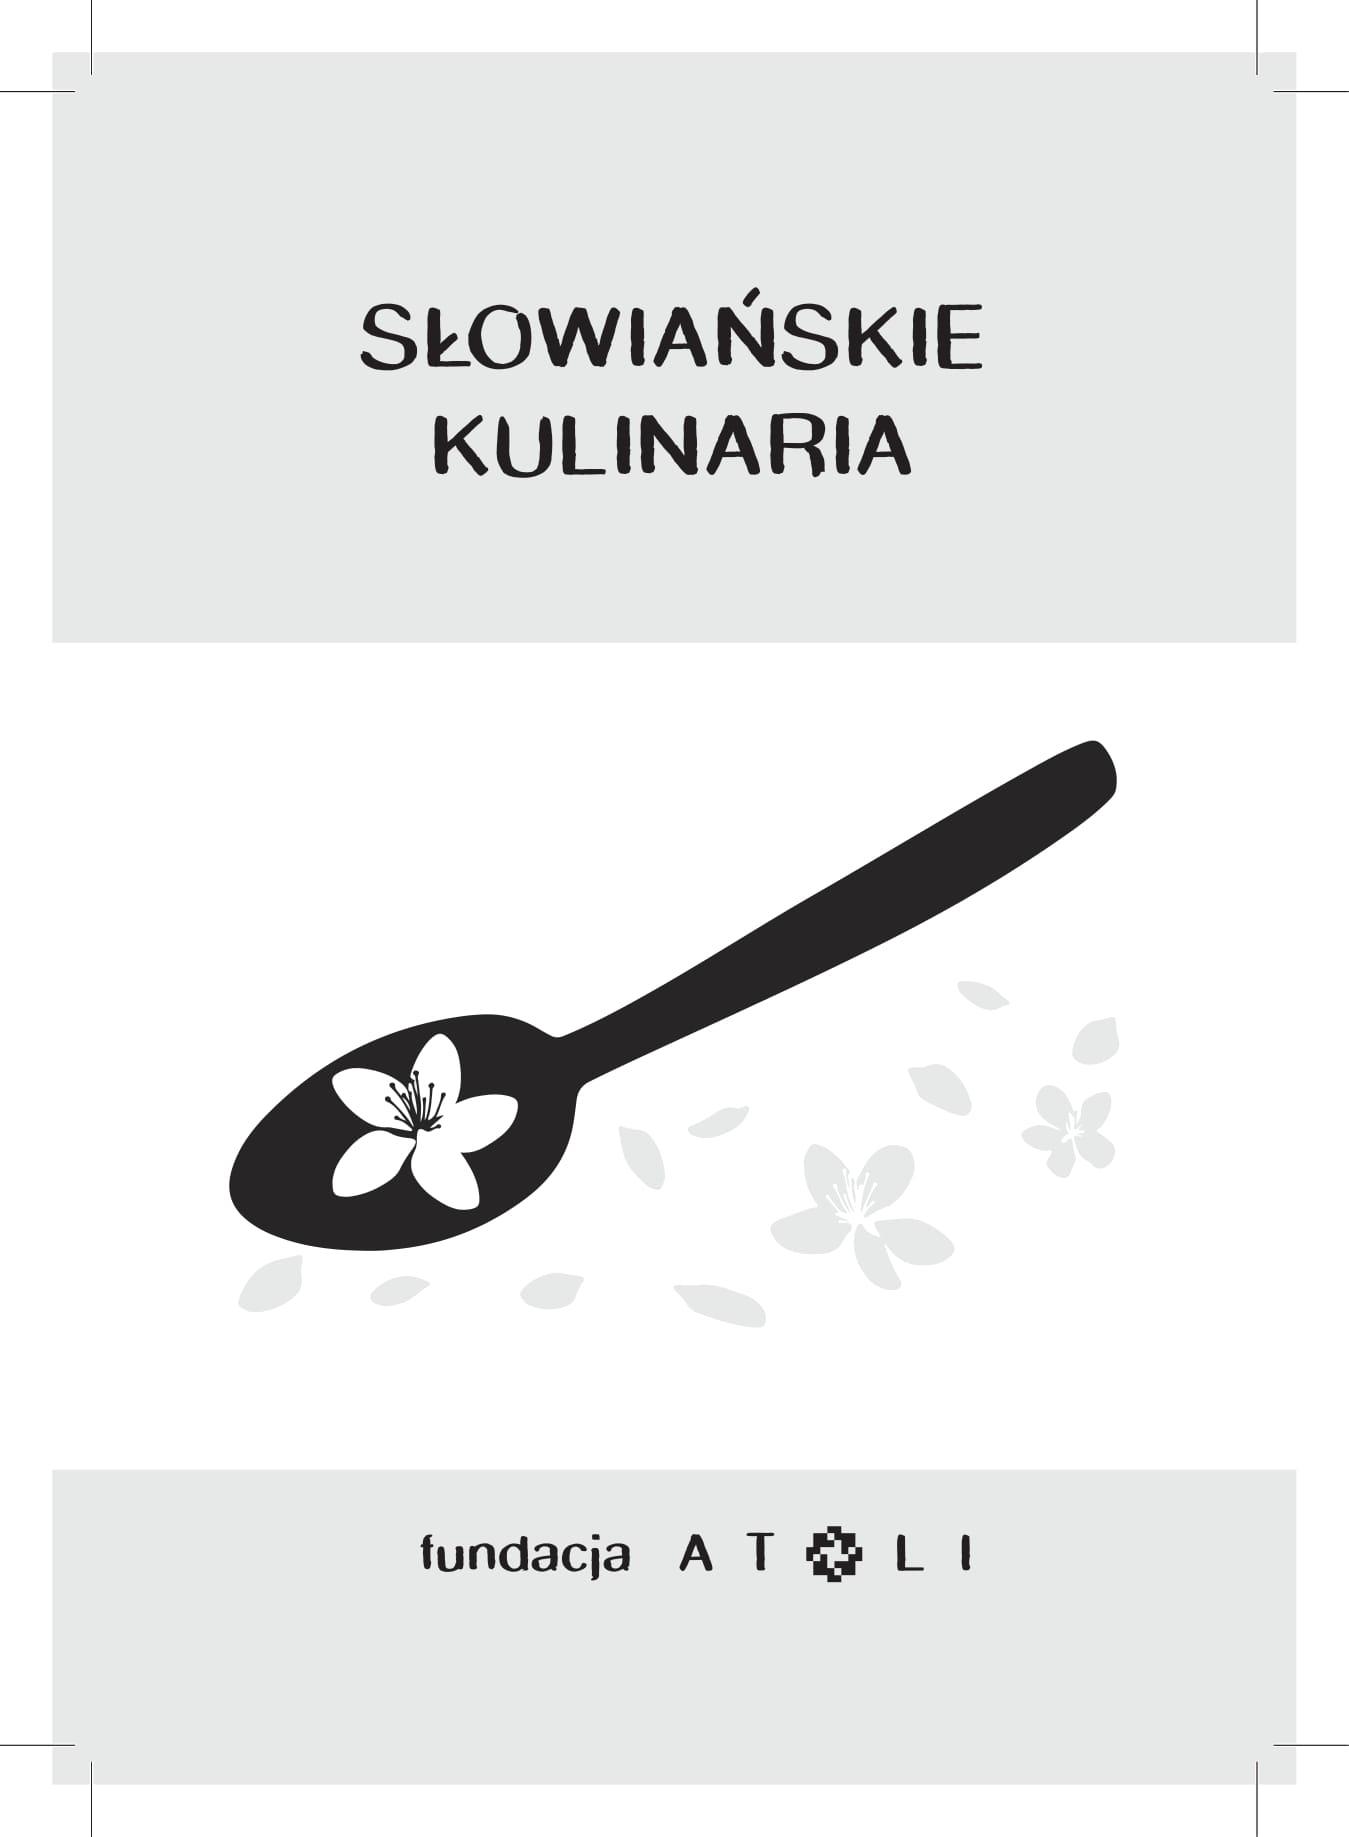 SlowianskaKuchnia_edit3-1